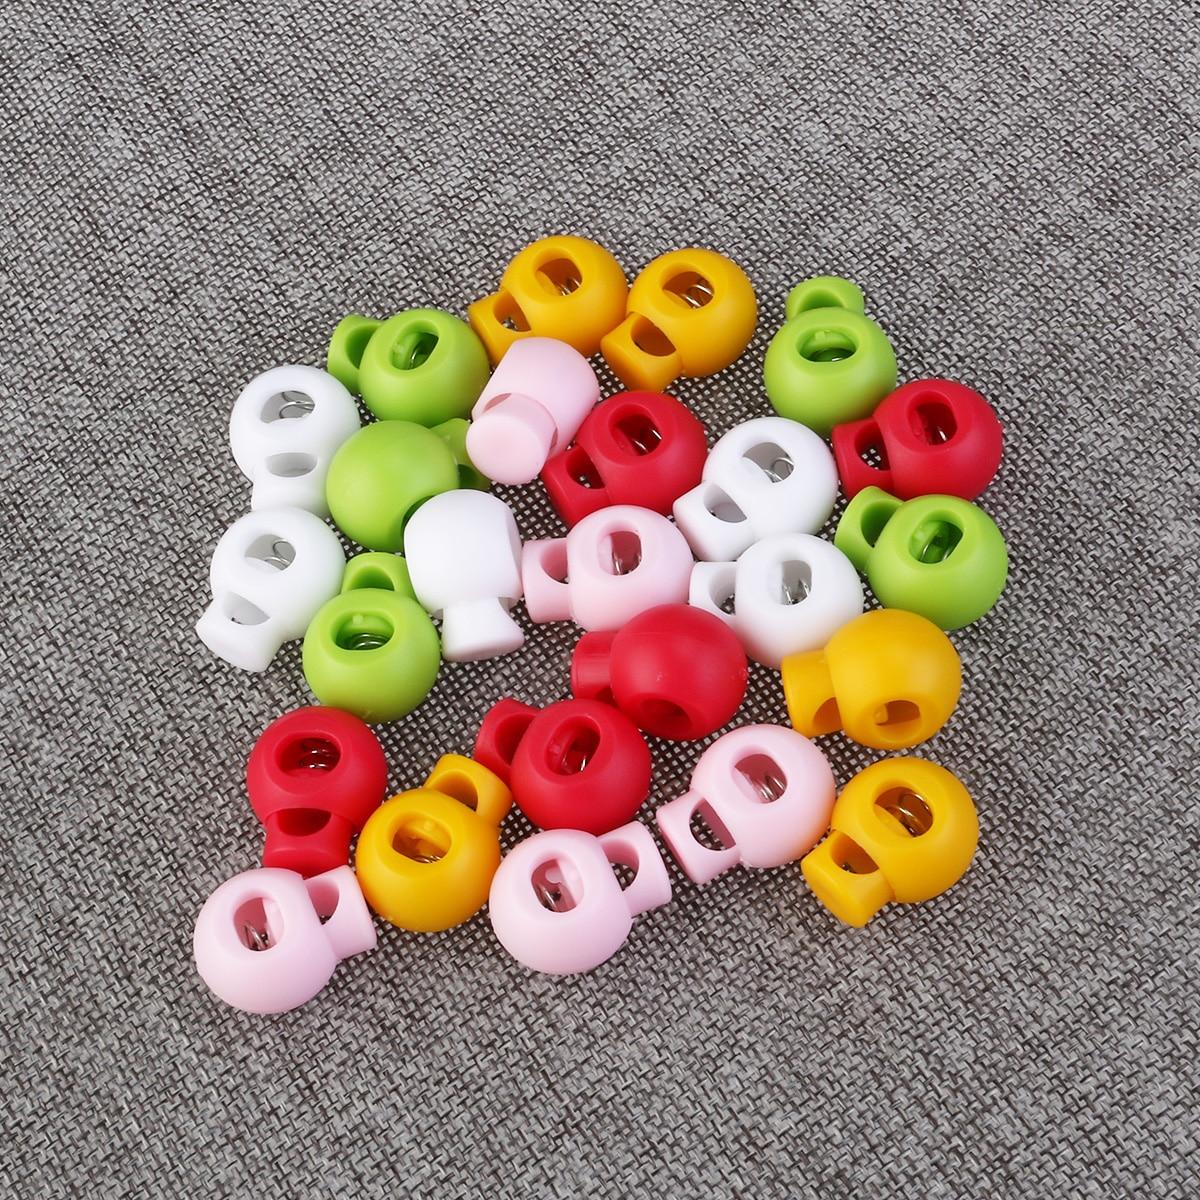 25 peças de vestuário elástico fivela banda primavera carregado plástico redondo toggle rolha cordão fechaduras cordlocks roupas diy acessórios